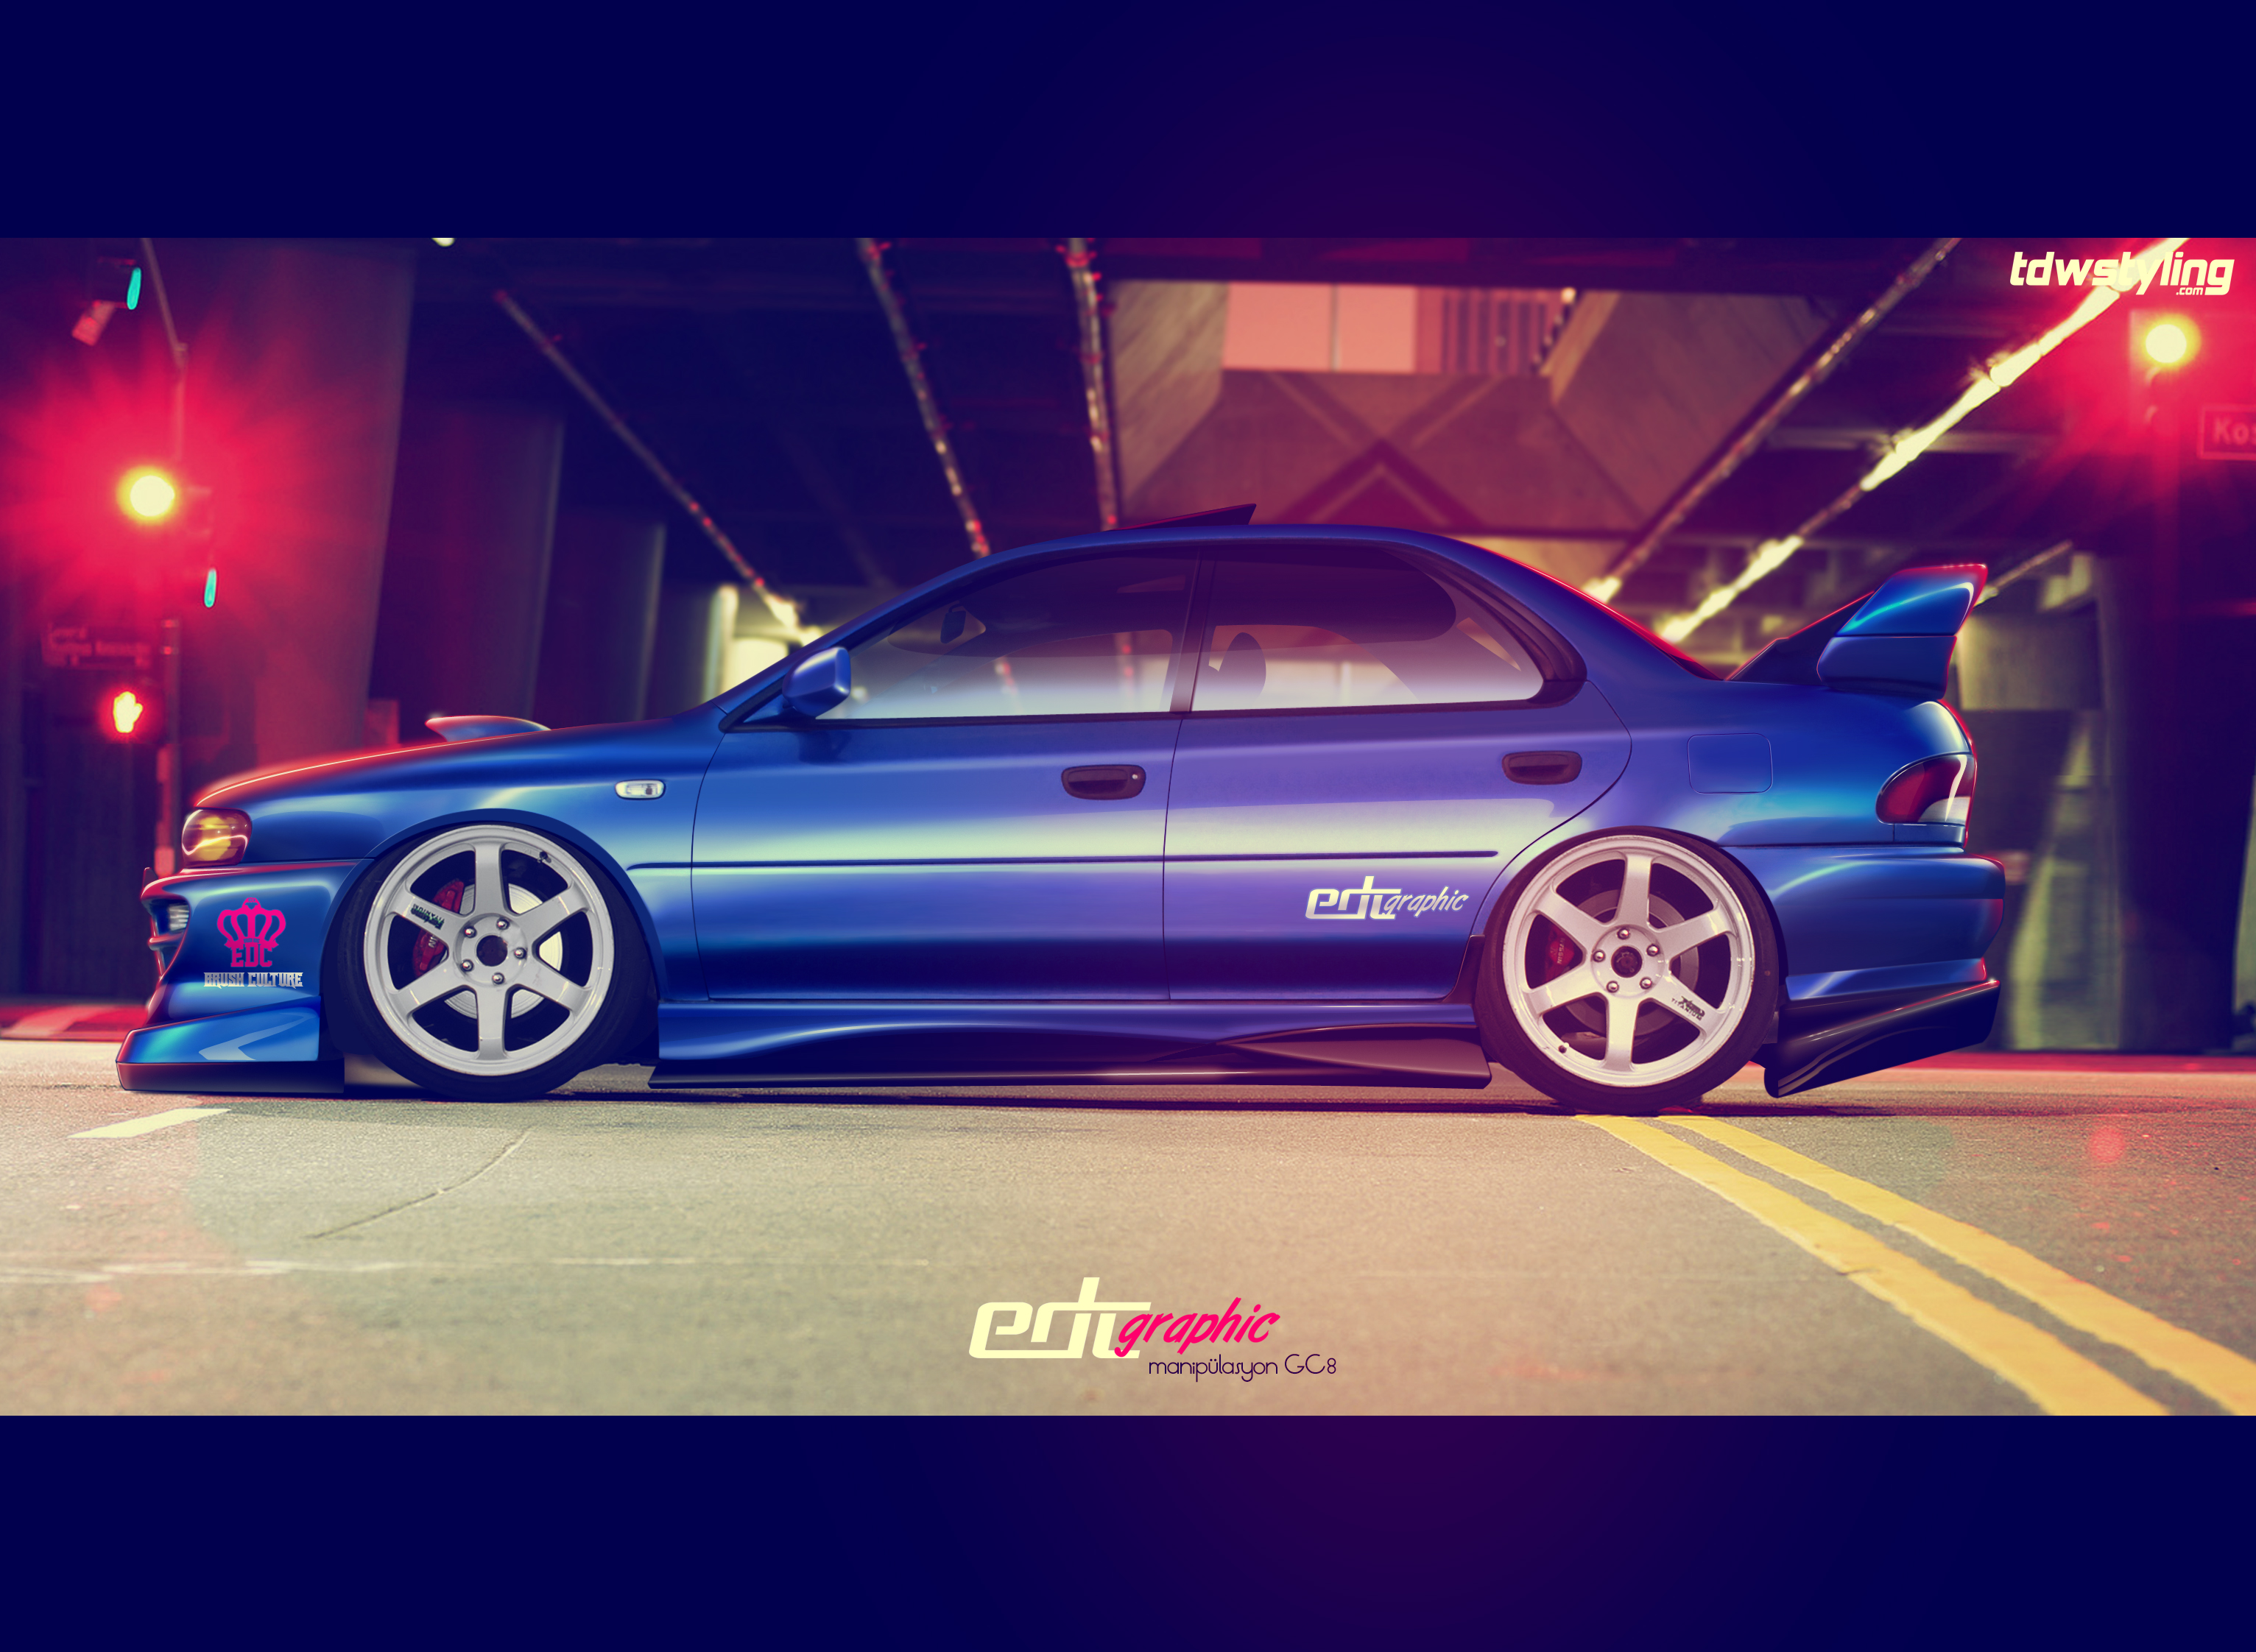 Subaru Impreza GC8 Manipulasyon by edcgraphic